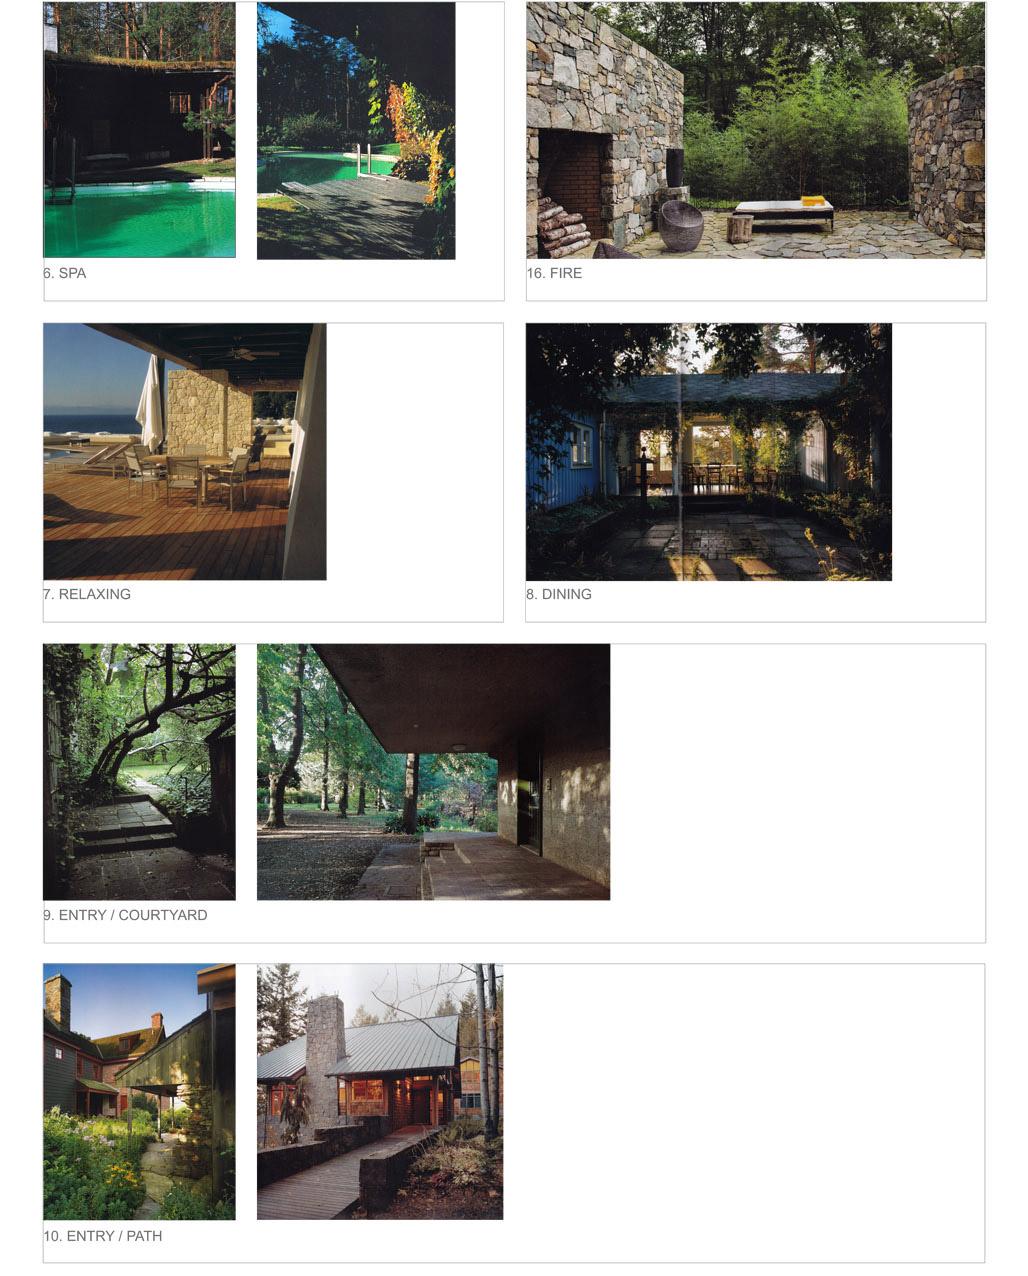 mullen-site-vision-3.jpg